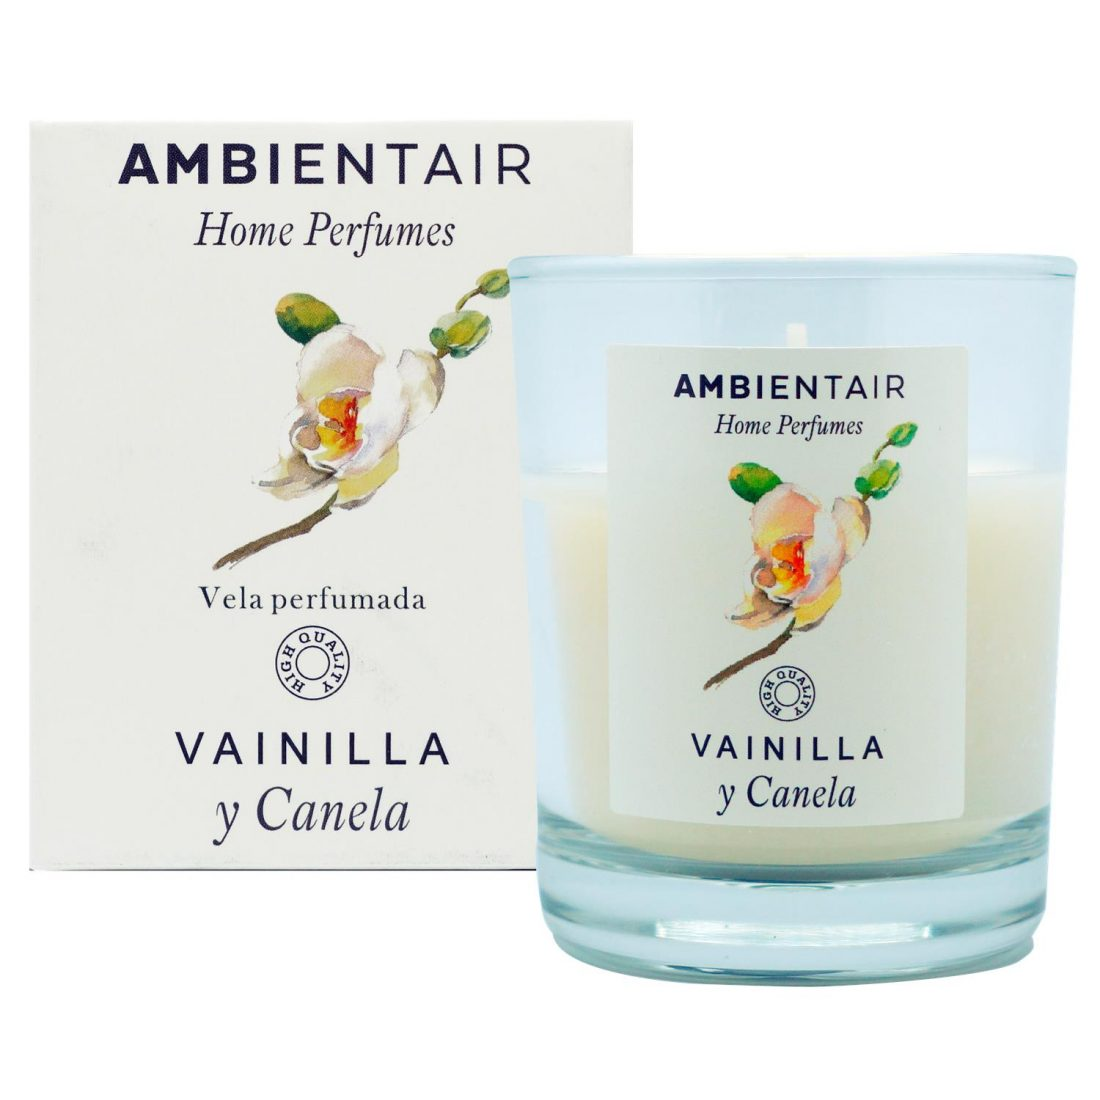 8435474410758 Vela 30 H Home Perfume Vc Estuche Y Vaso 2